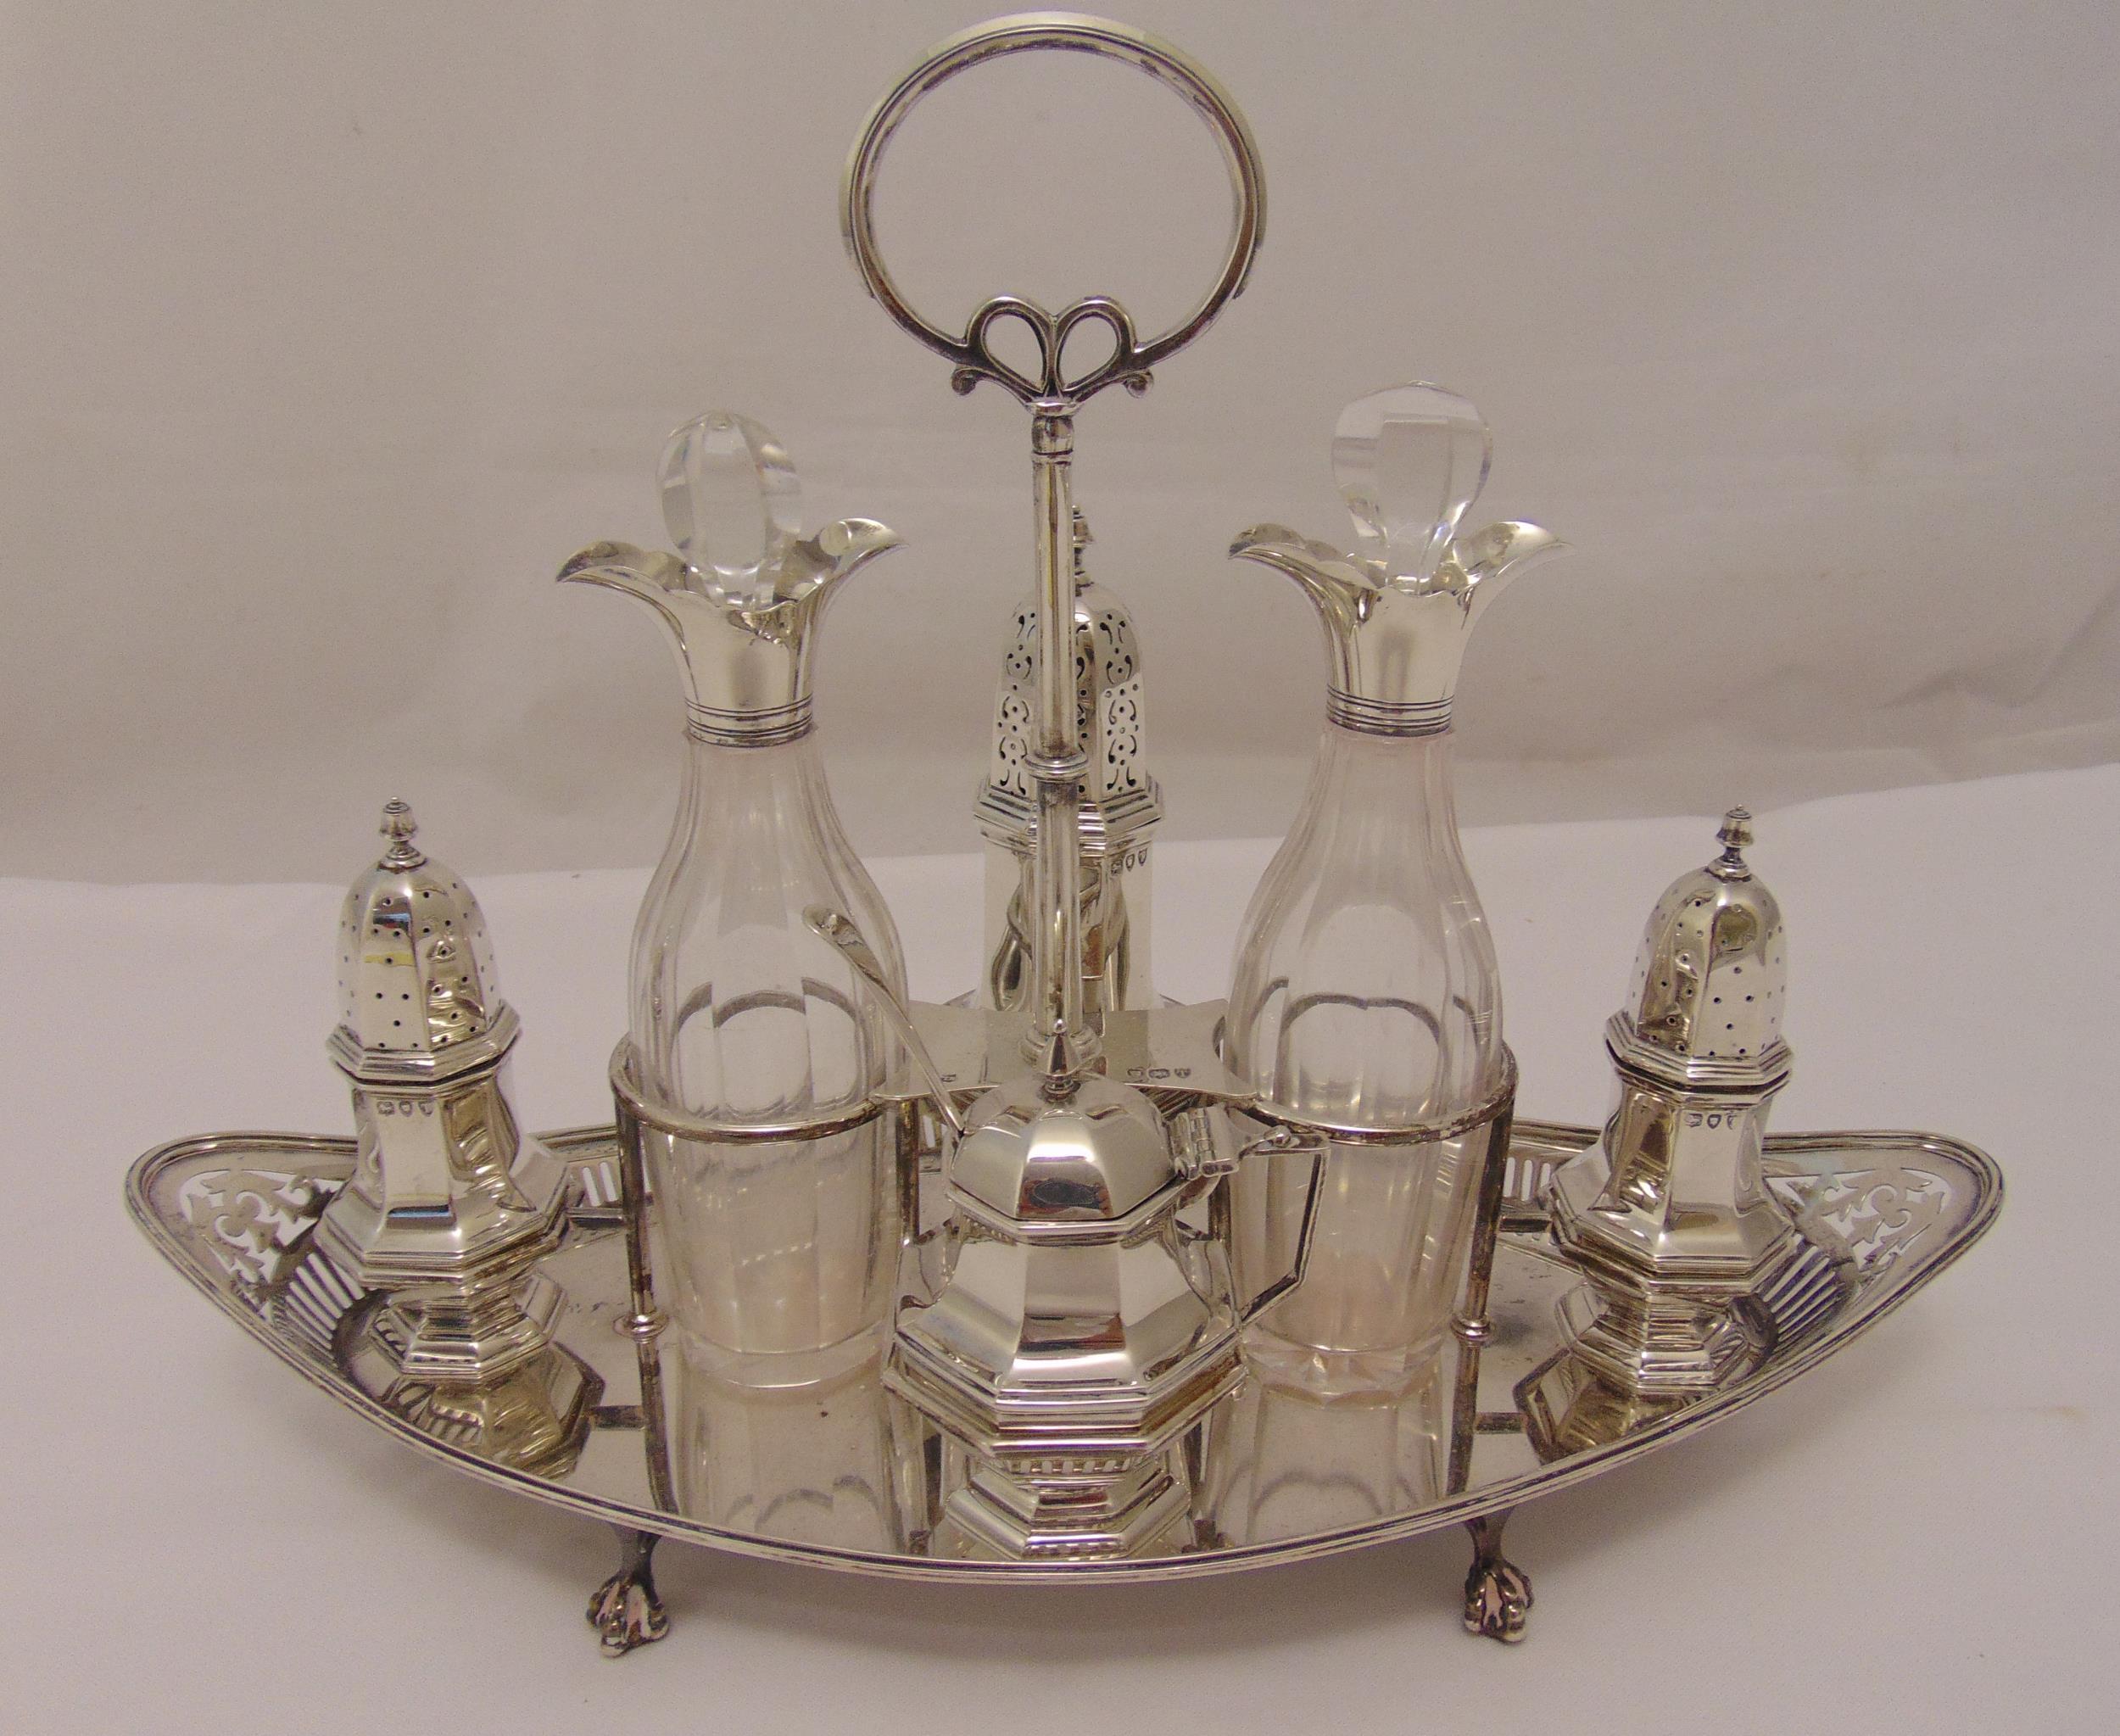 A Victorian hallmarked silver cruet set comprising a sugar sifter, a mustard pot with spoon, a